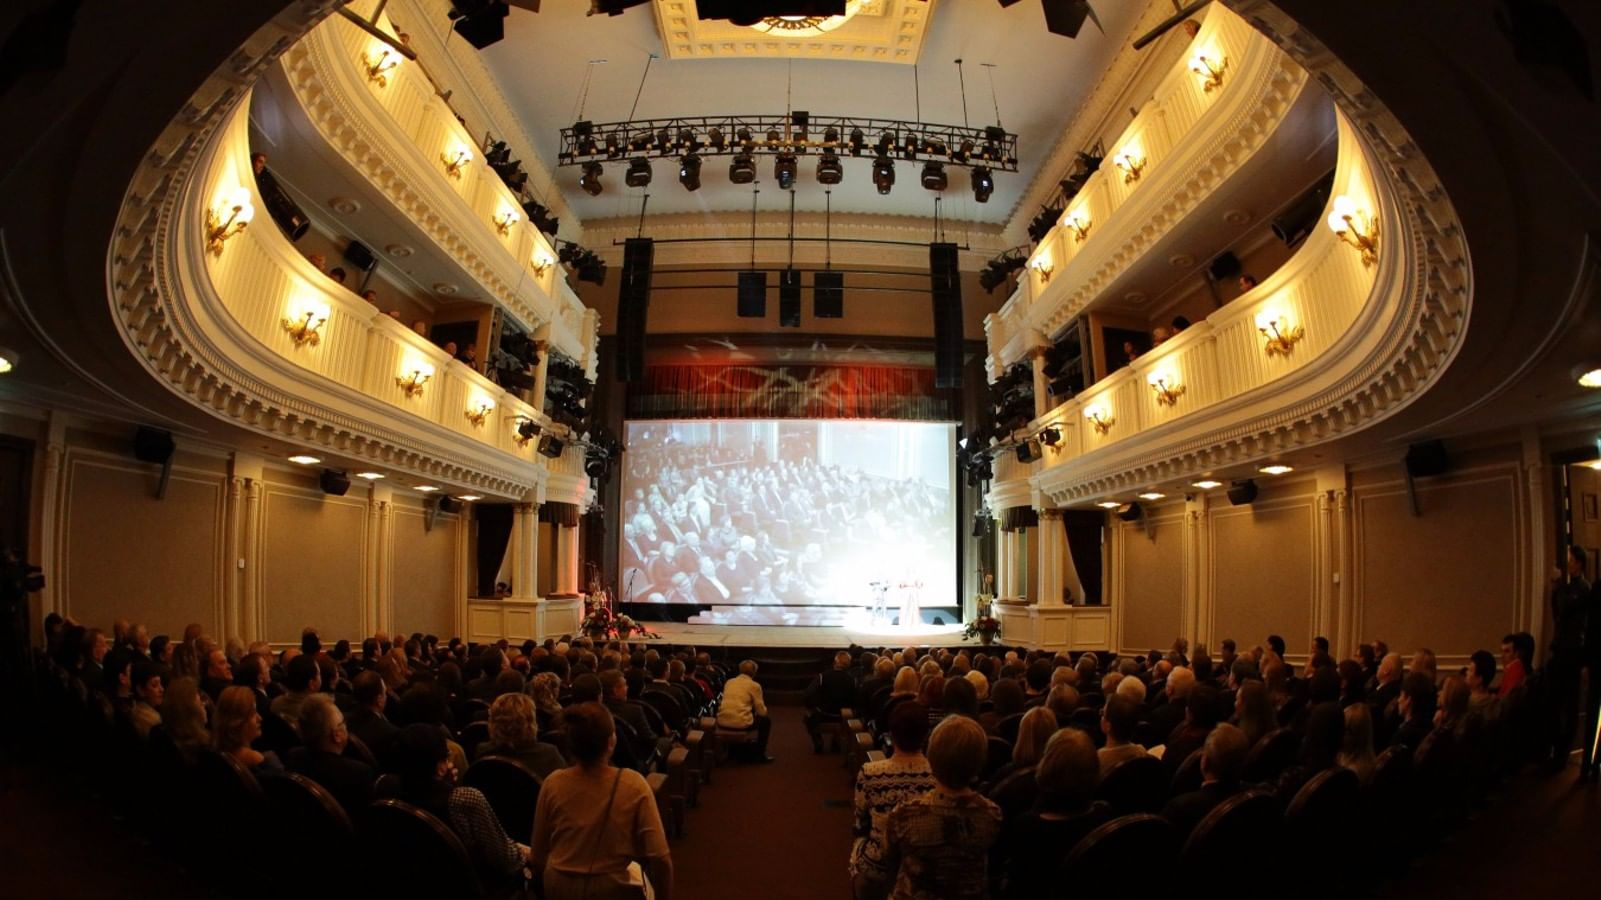 Афиша театра пушкина красноярска элион спектакль билеты